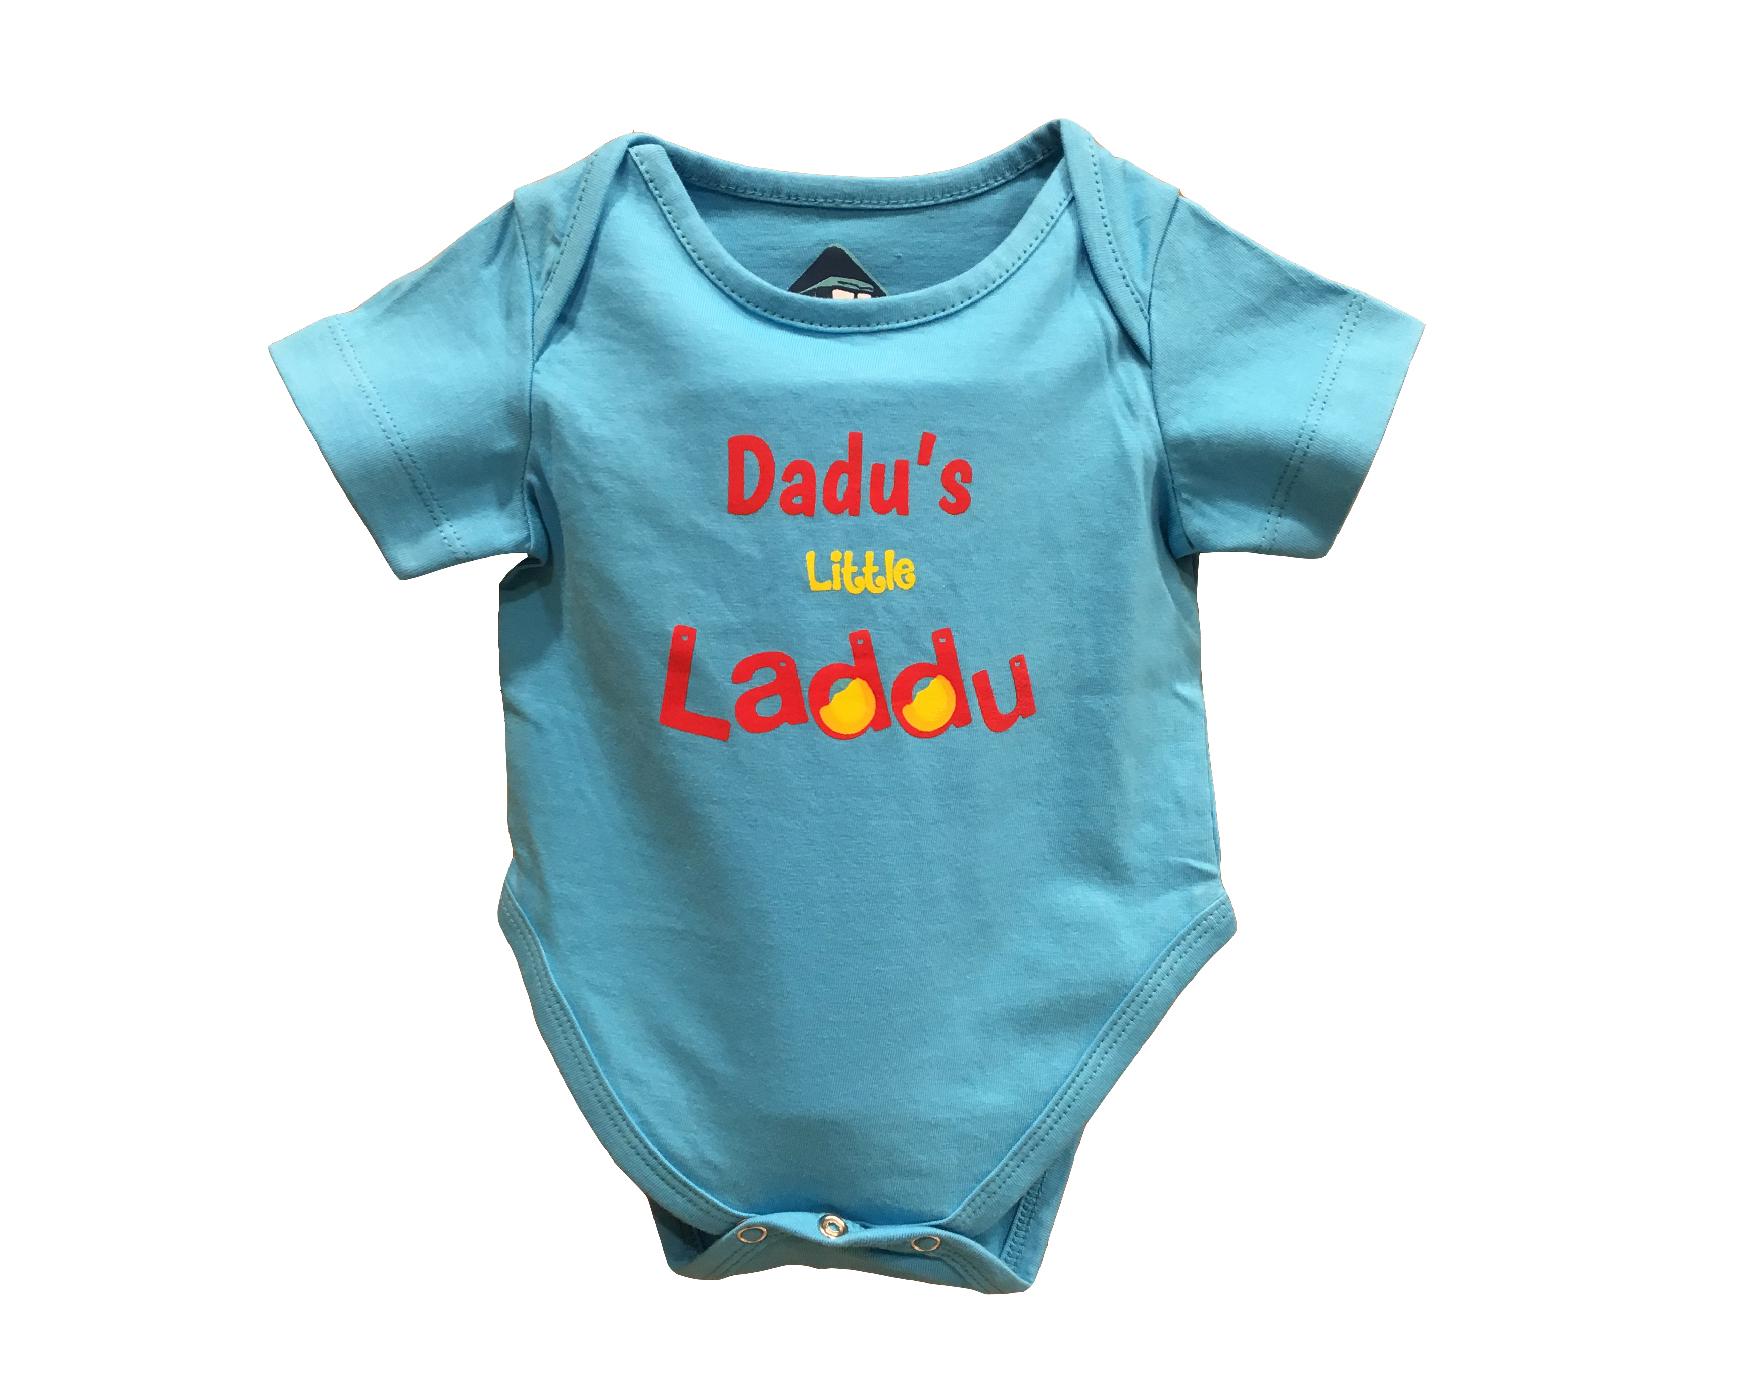 DADDUS-LITTLE-LADDU-BLUE.jpg